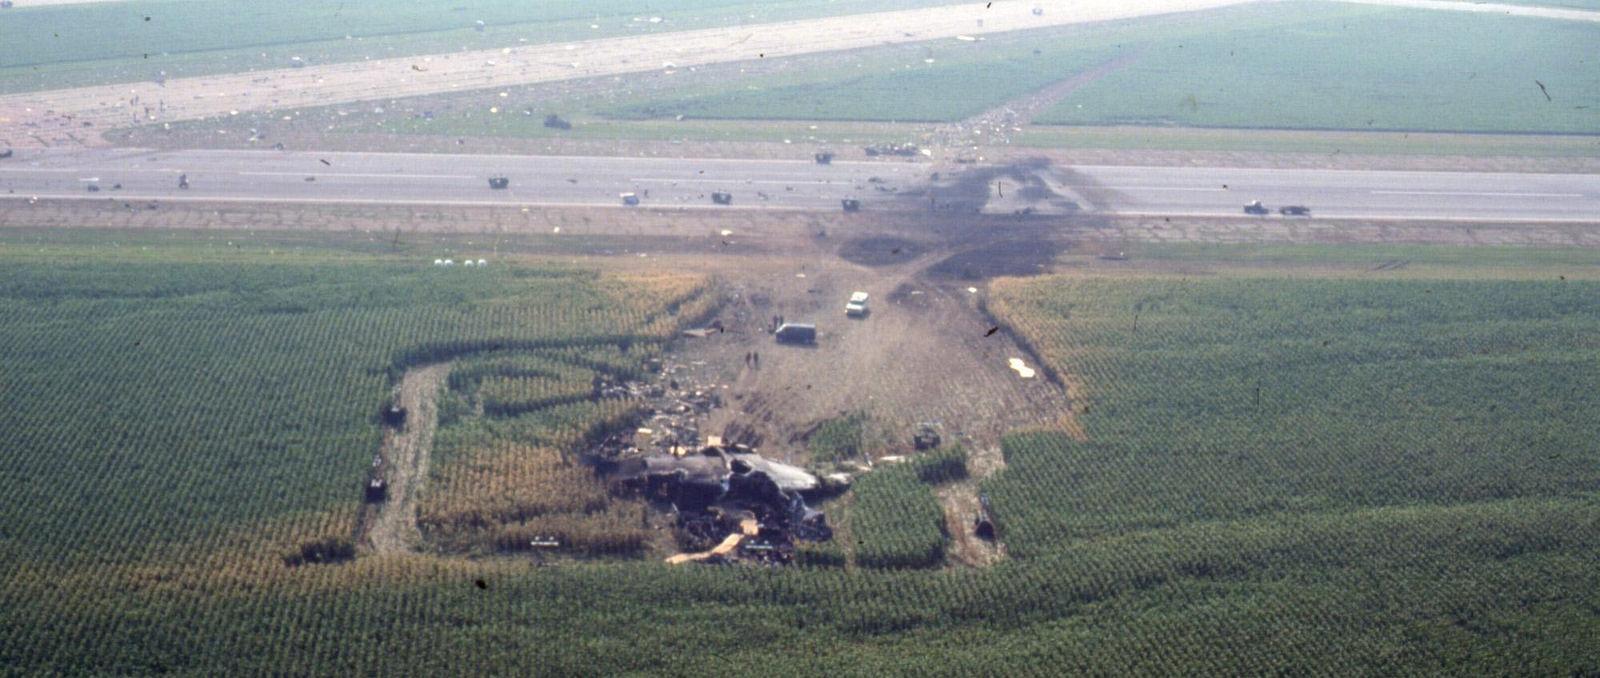 United Airlines Flight 232 Was The Deadliest Plane Crash